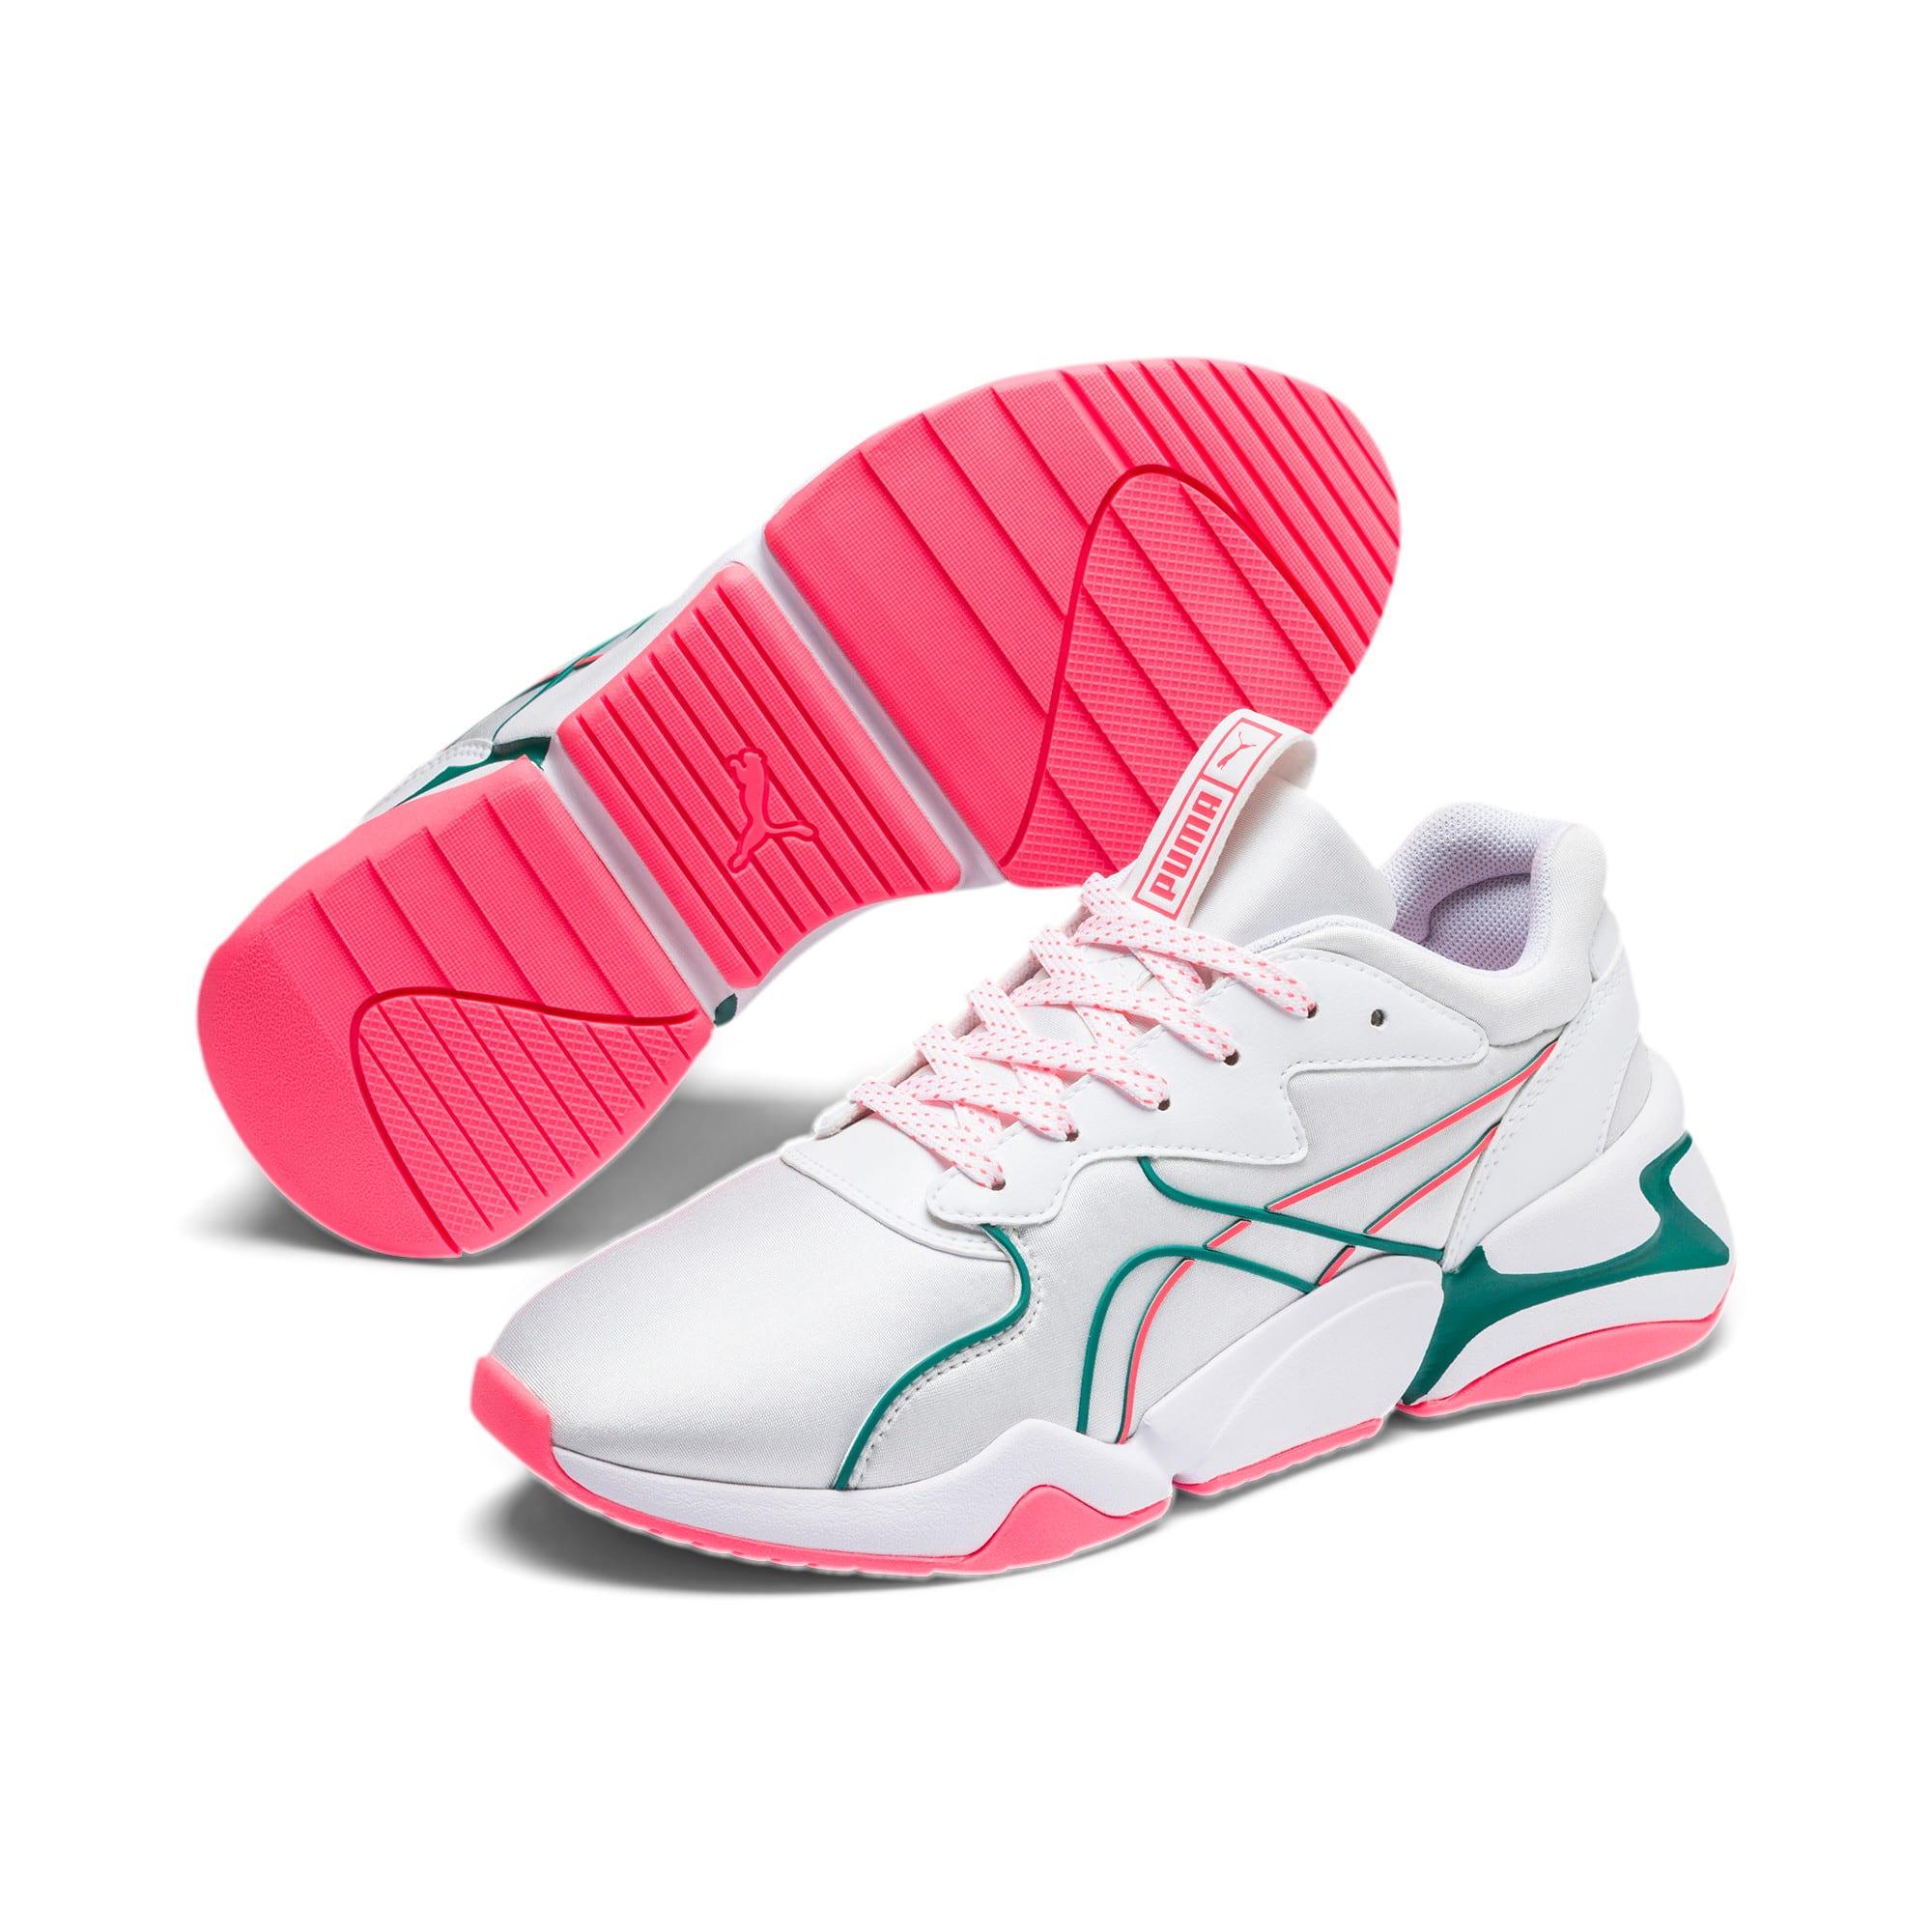 Thumbnail 3 of Nova Hypertech Women's Sneakers, Puma White, medium